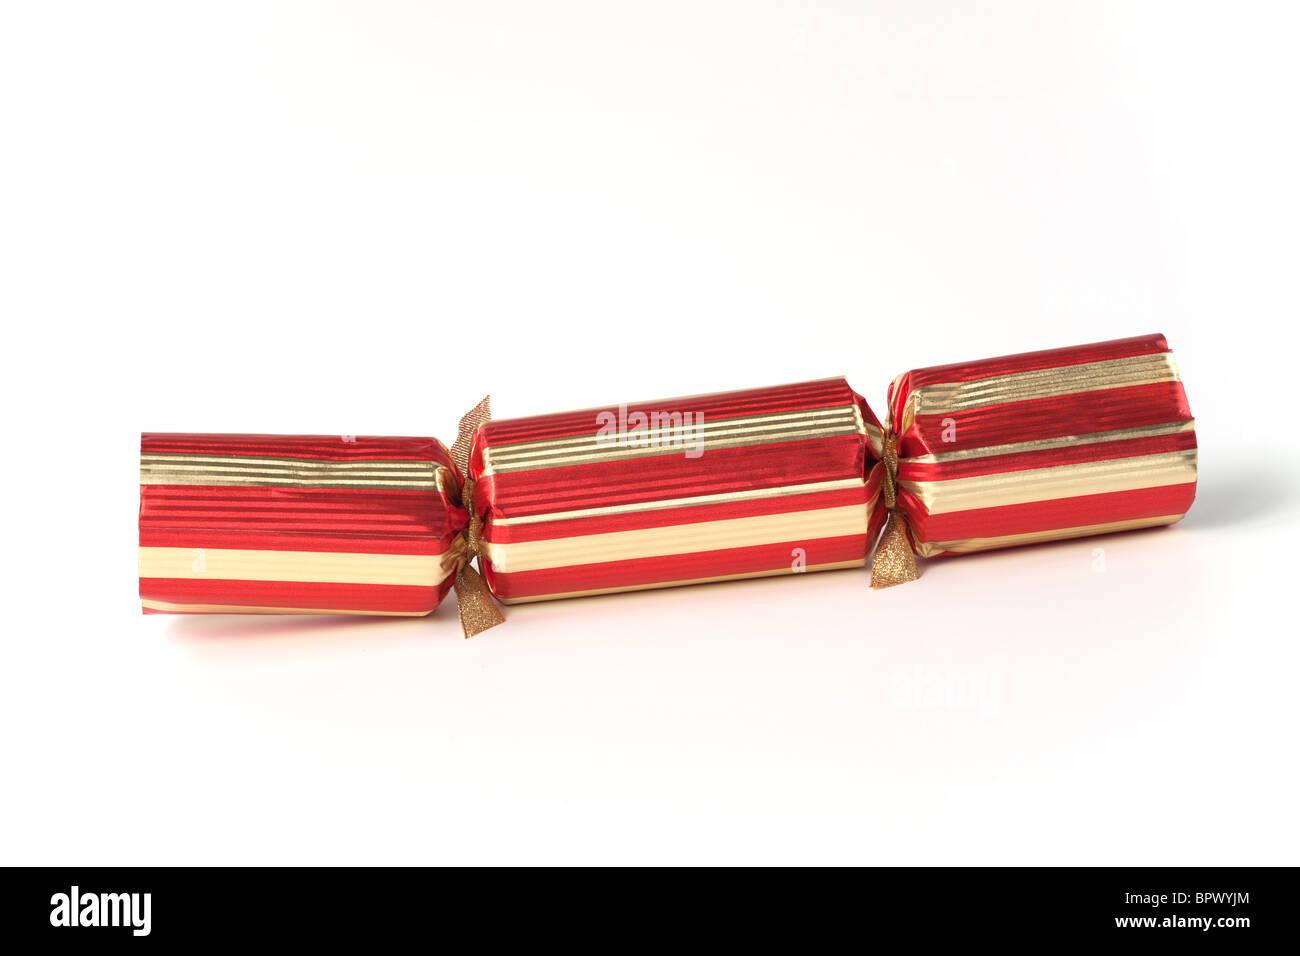 Red and gold elegant large Christmas cracker - Stock Image